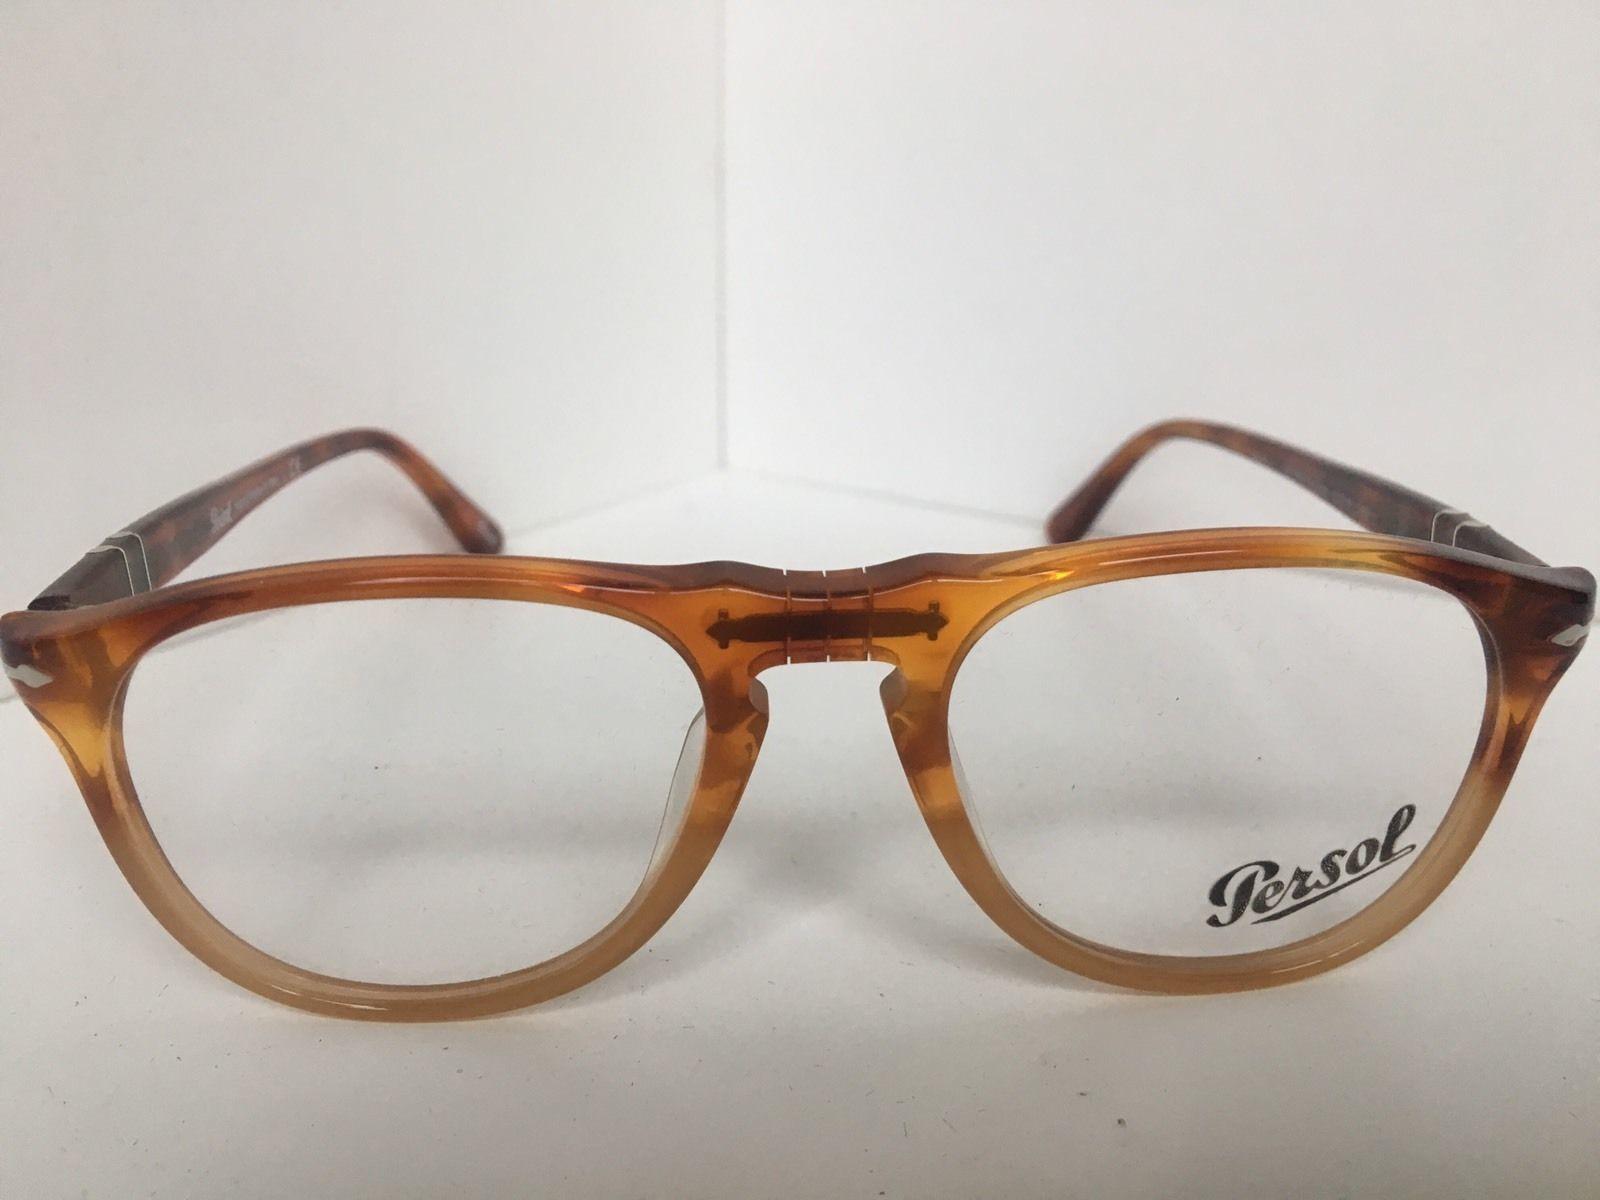 219477a939 New Persol 9649-V 1025 Amber Resina e Sale 50mm Eyeglasses Frame Italy